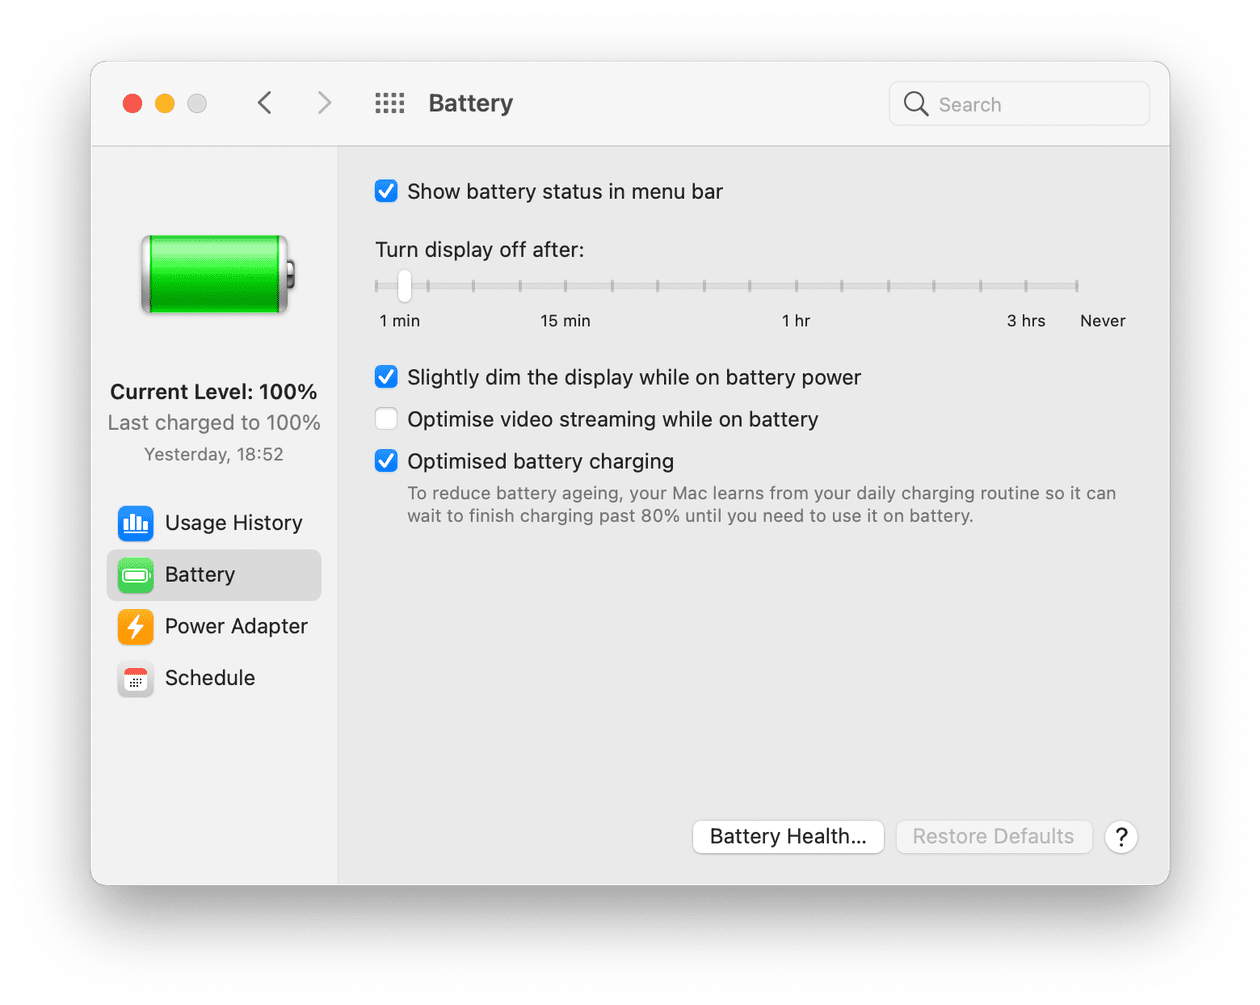 Macbook battery settings